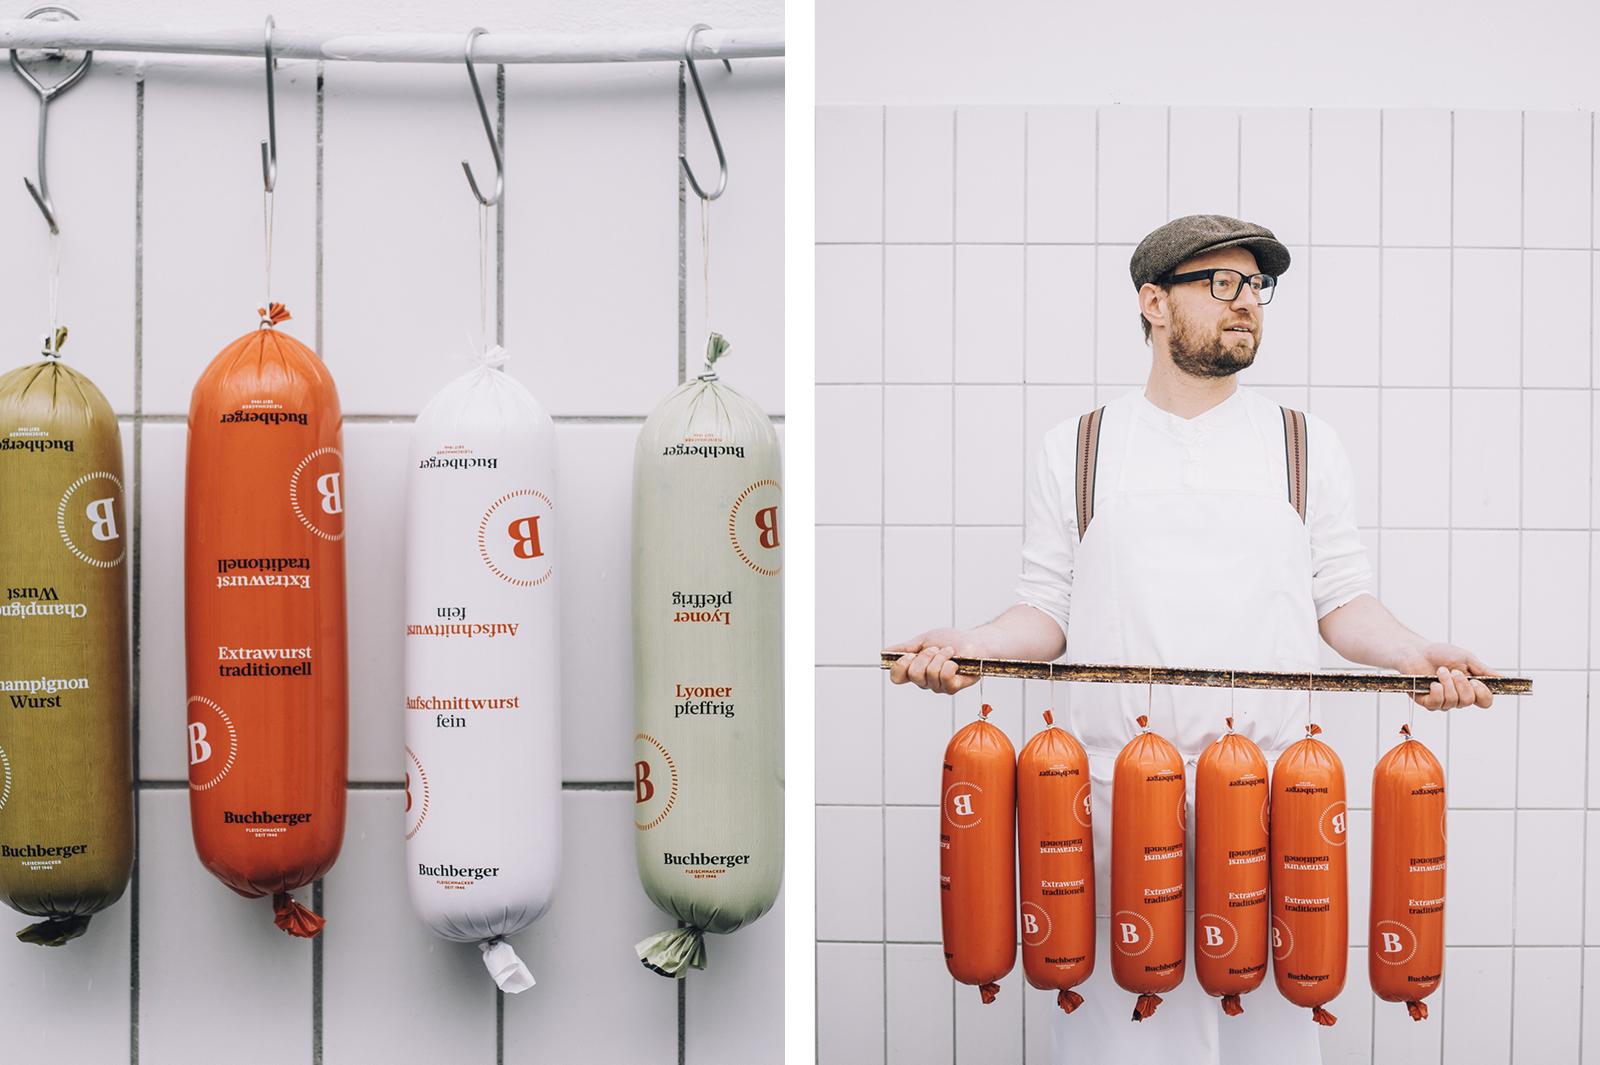 Buchberger butcher shop branding and identity design by Riebenbauer